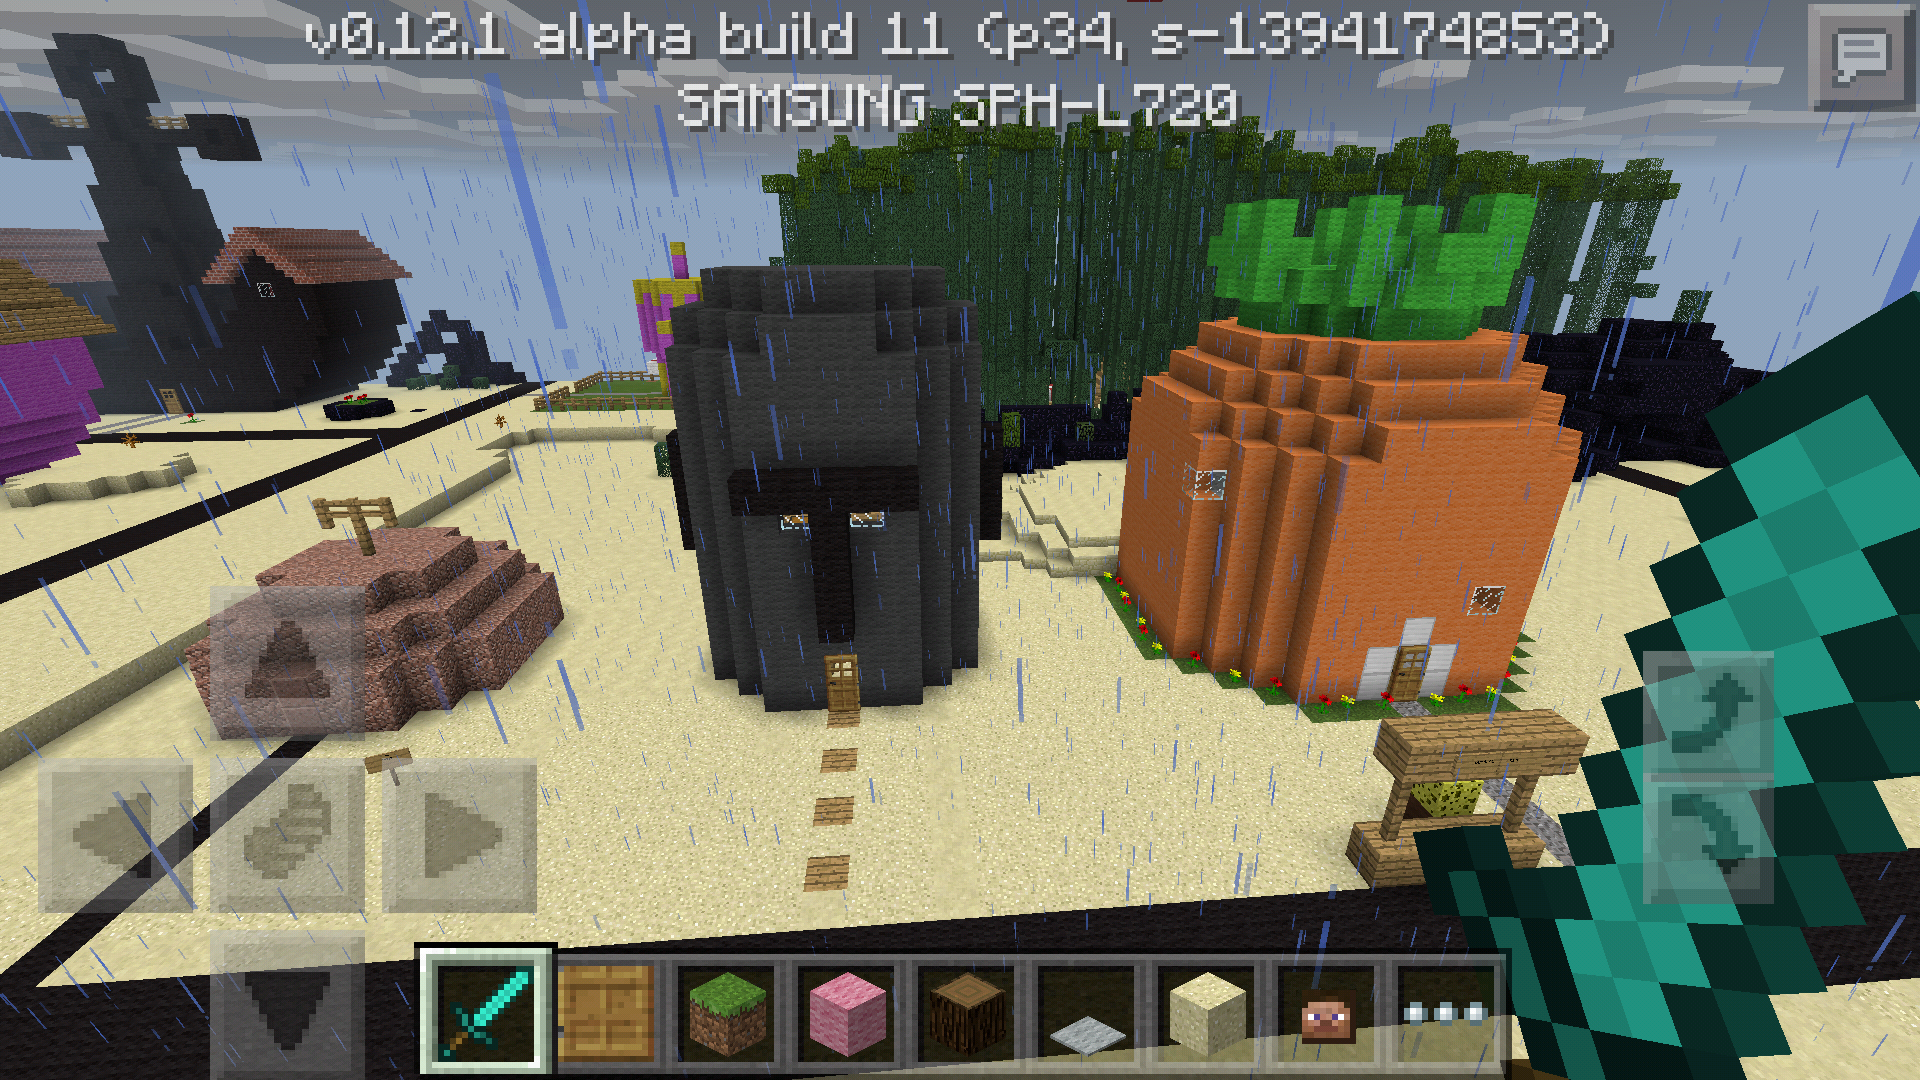 The Best MCPE Bikini Bottem Map Ever Made MCPE Maps Minecraft - Die besten maps fur minecraft pe